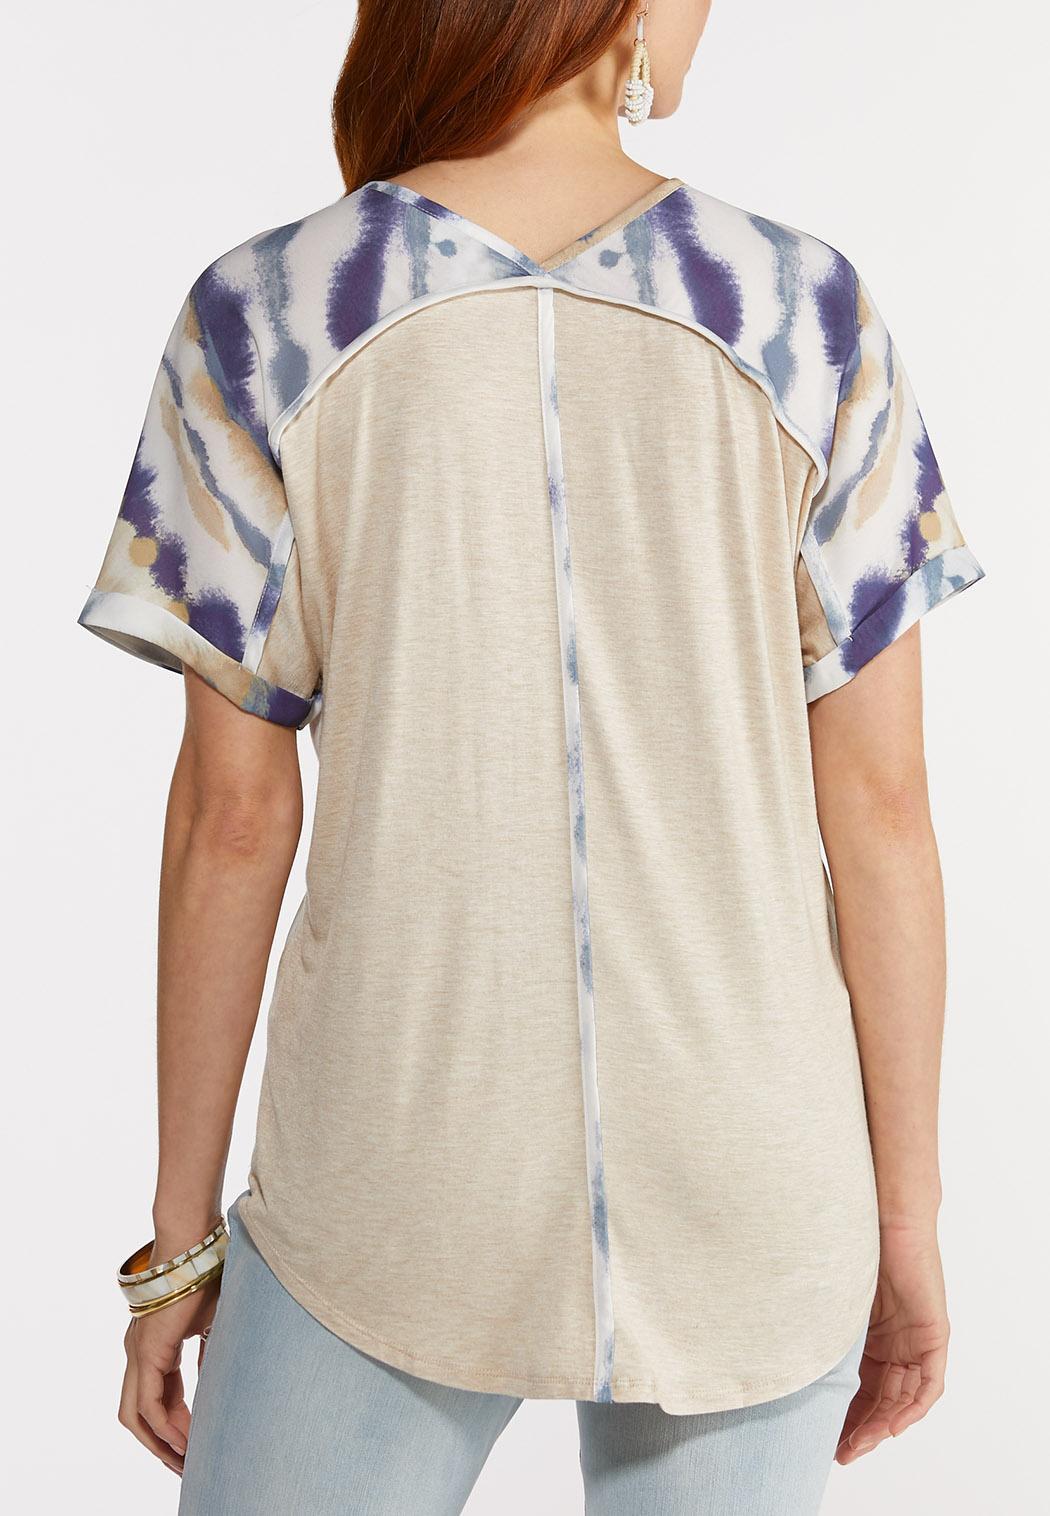 Plus Size Silky Tie Dye Top (Item #44325768)